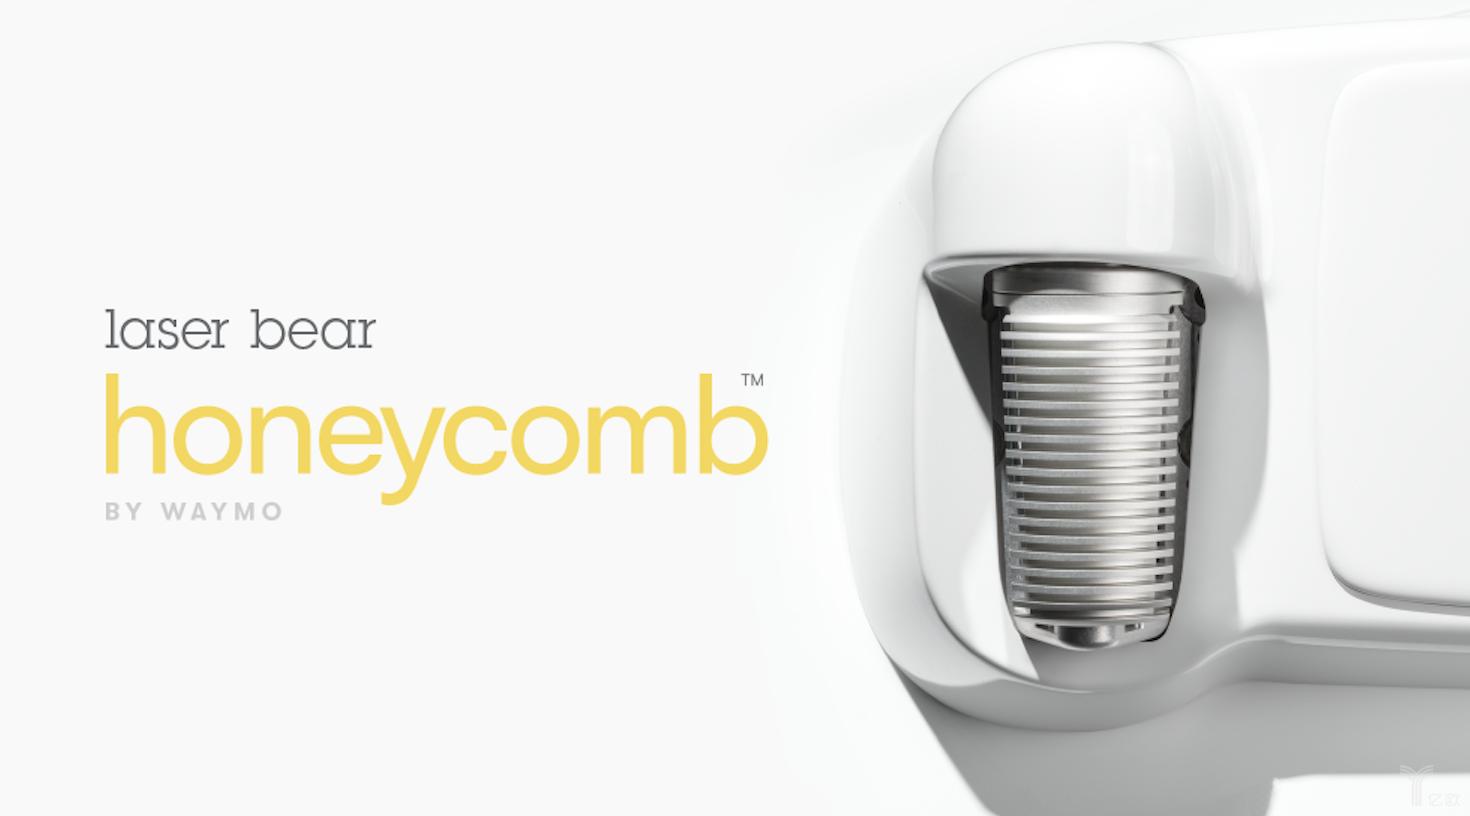 Waymo的激光雷达 Honeycomb